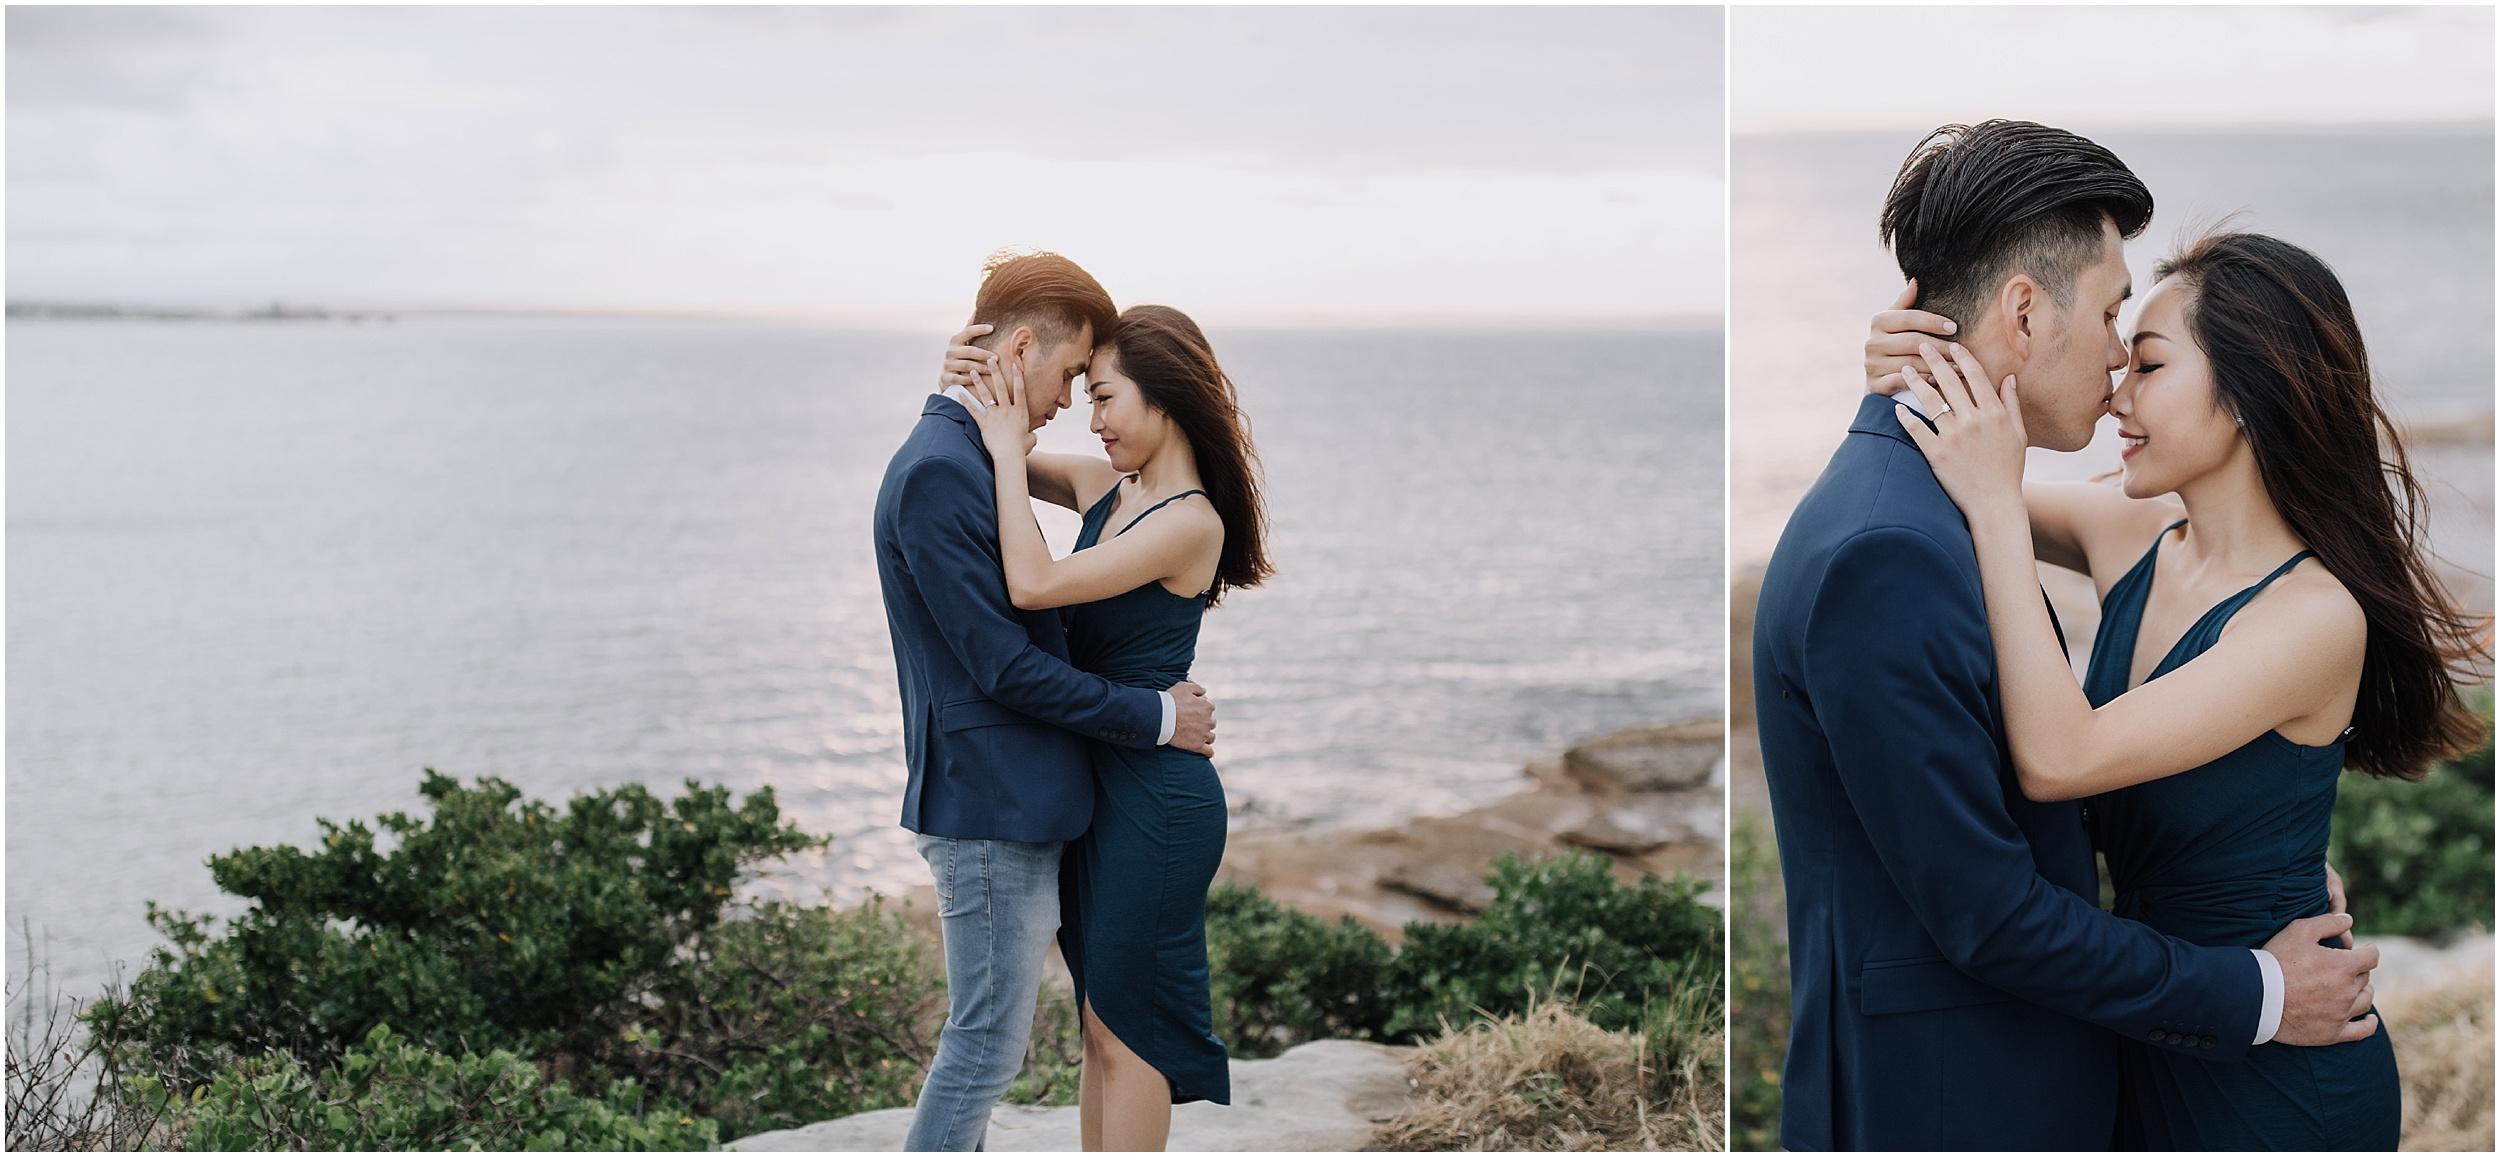 Sydney Pre-Wedding Engagement Photos La Perouse 7